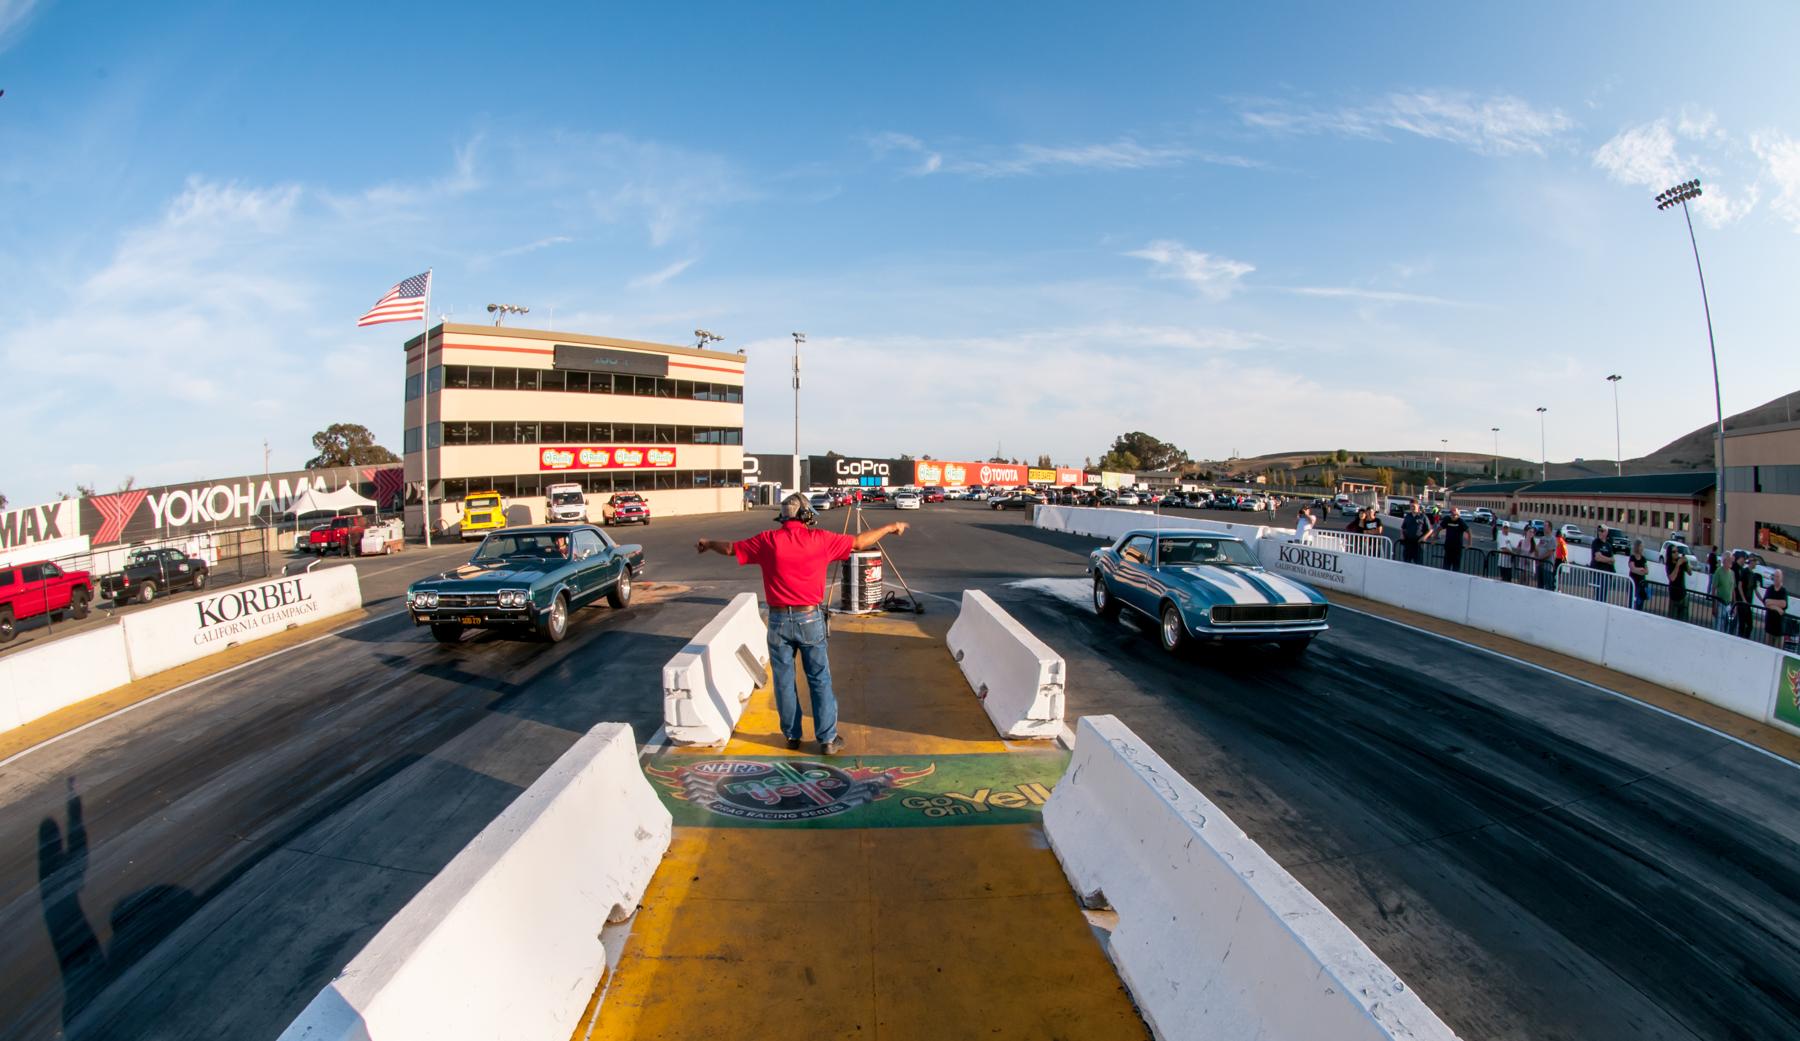 sonoma raceway drags